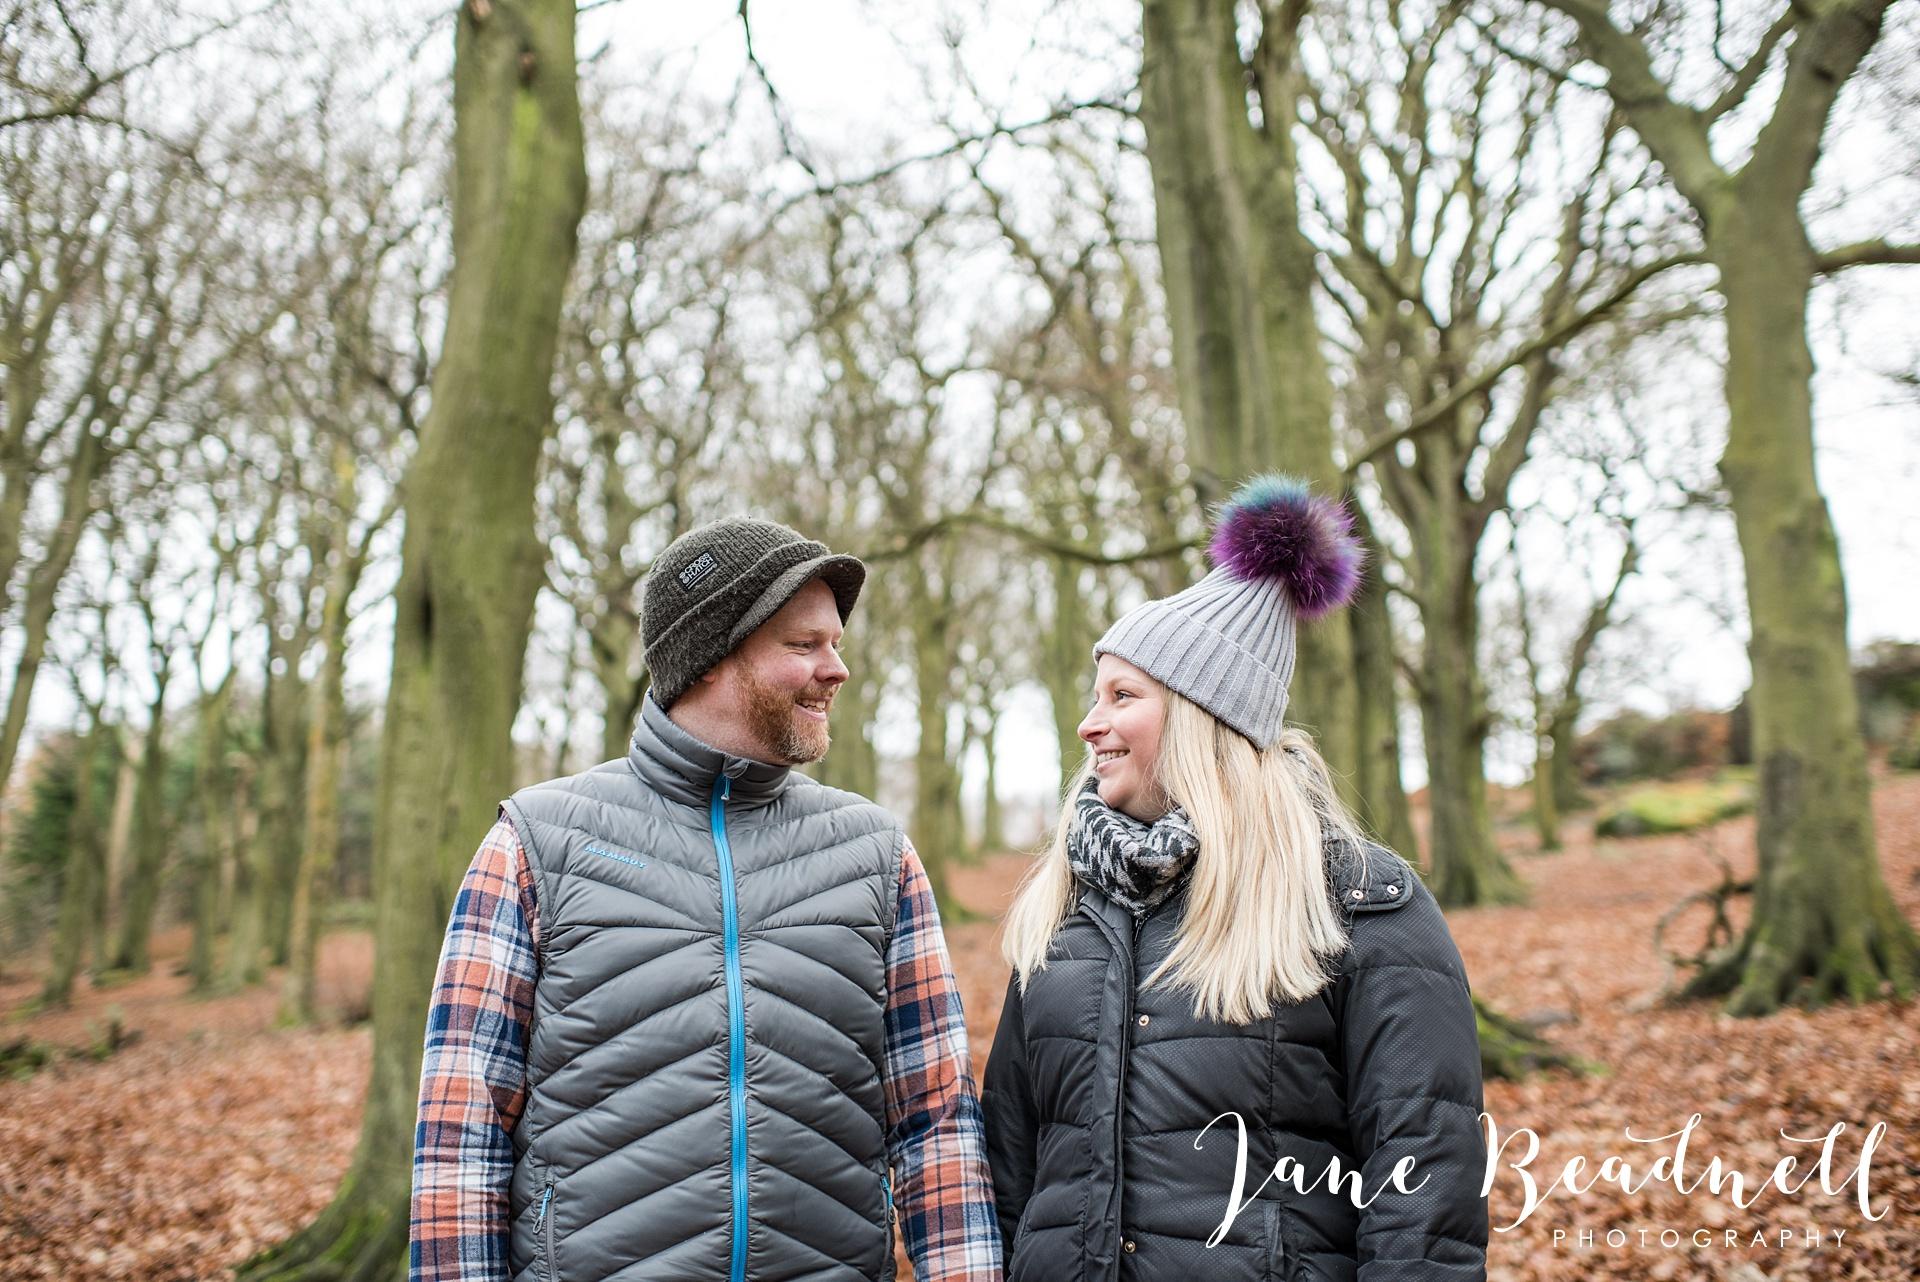 yorkshire-wedding-photographer-jane-beadnell-photography-uk-and-destination-wedding-photographer-engagement-shoot_0045